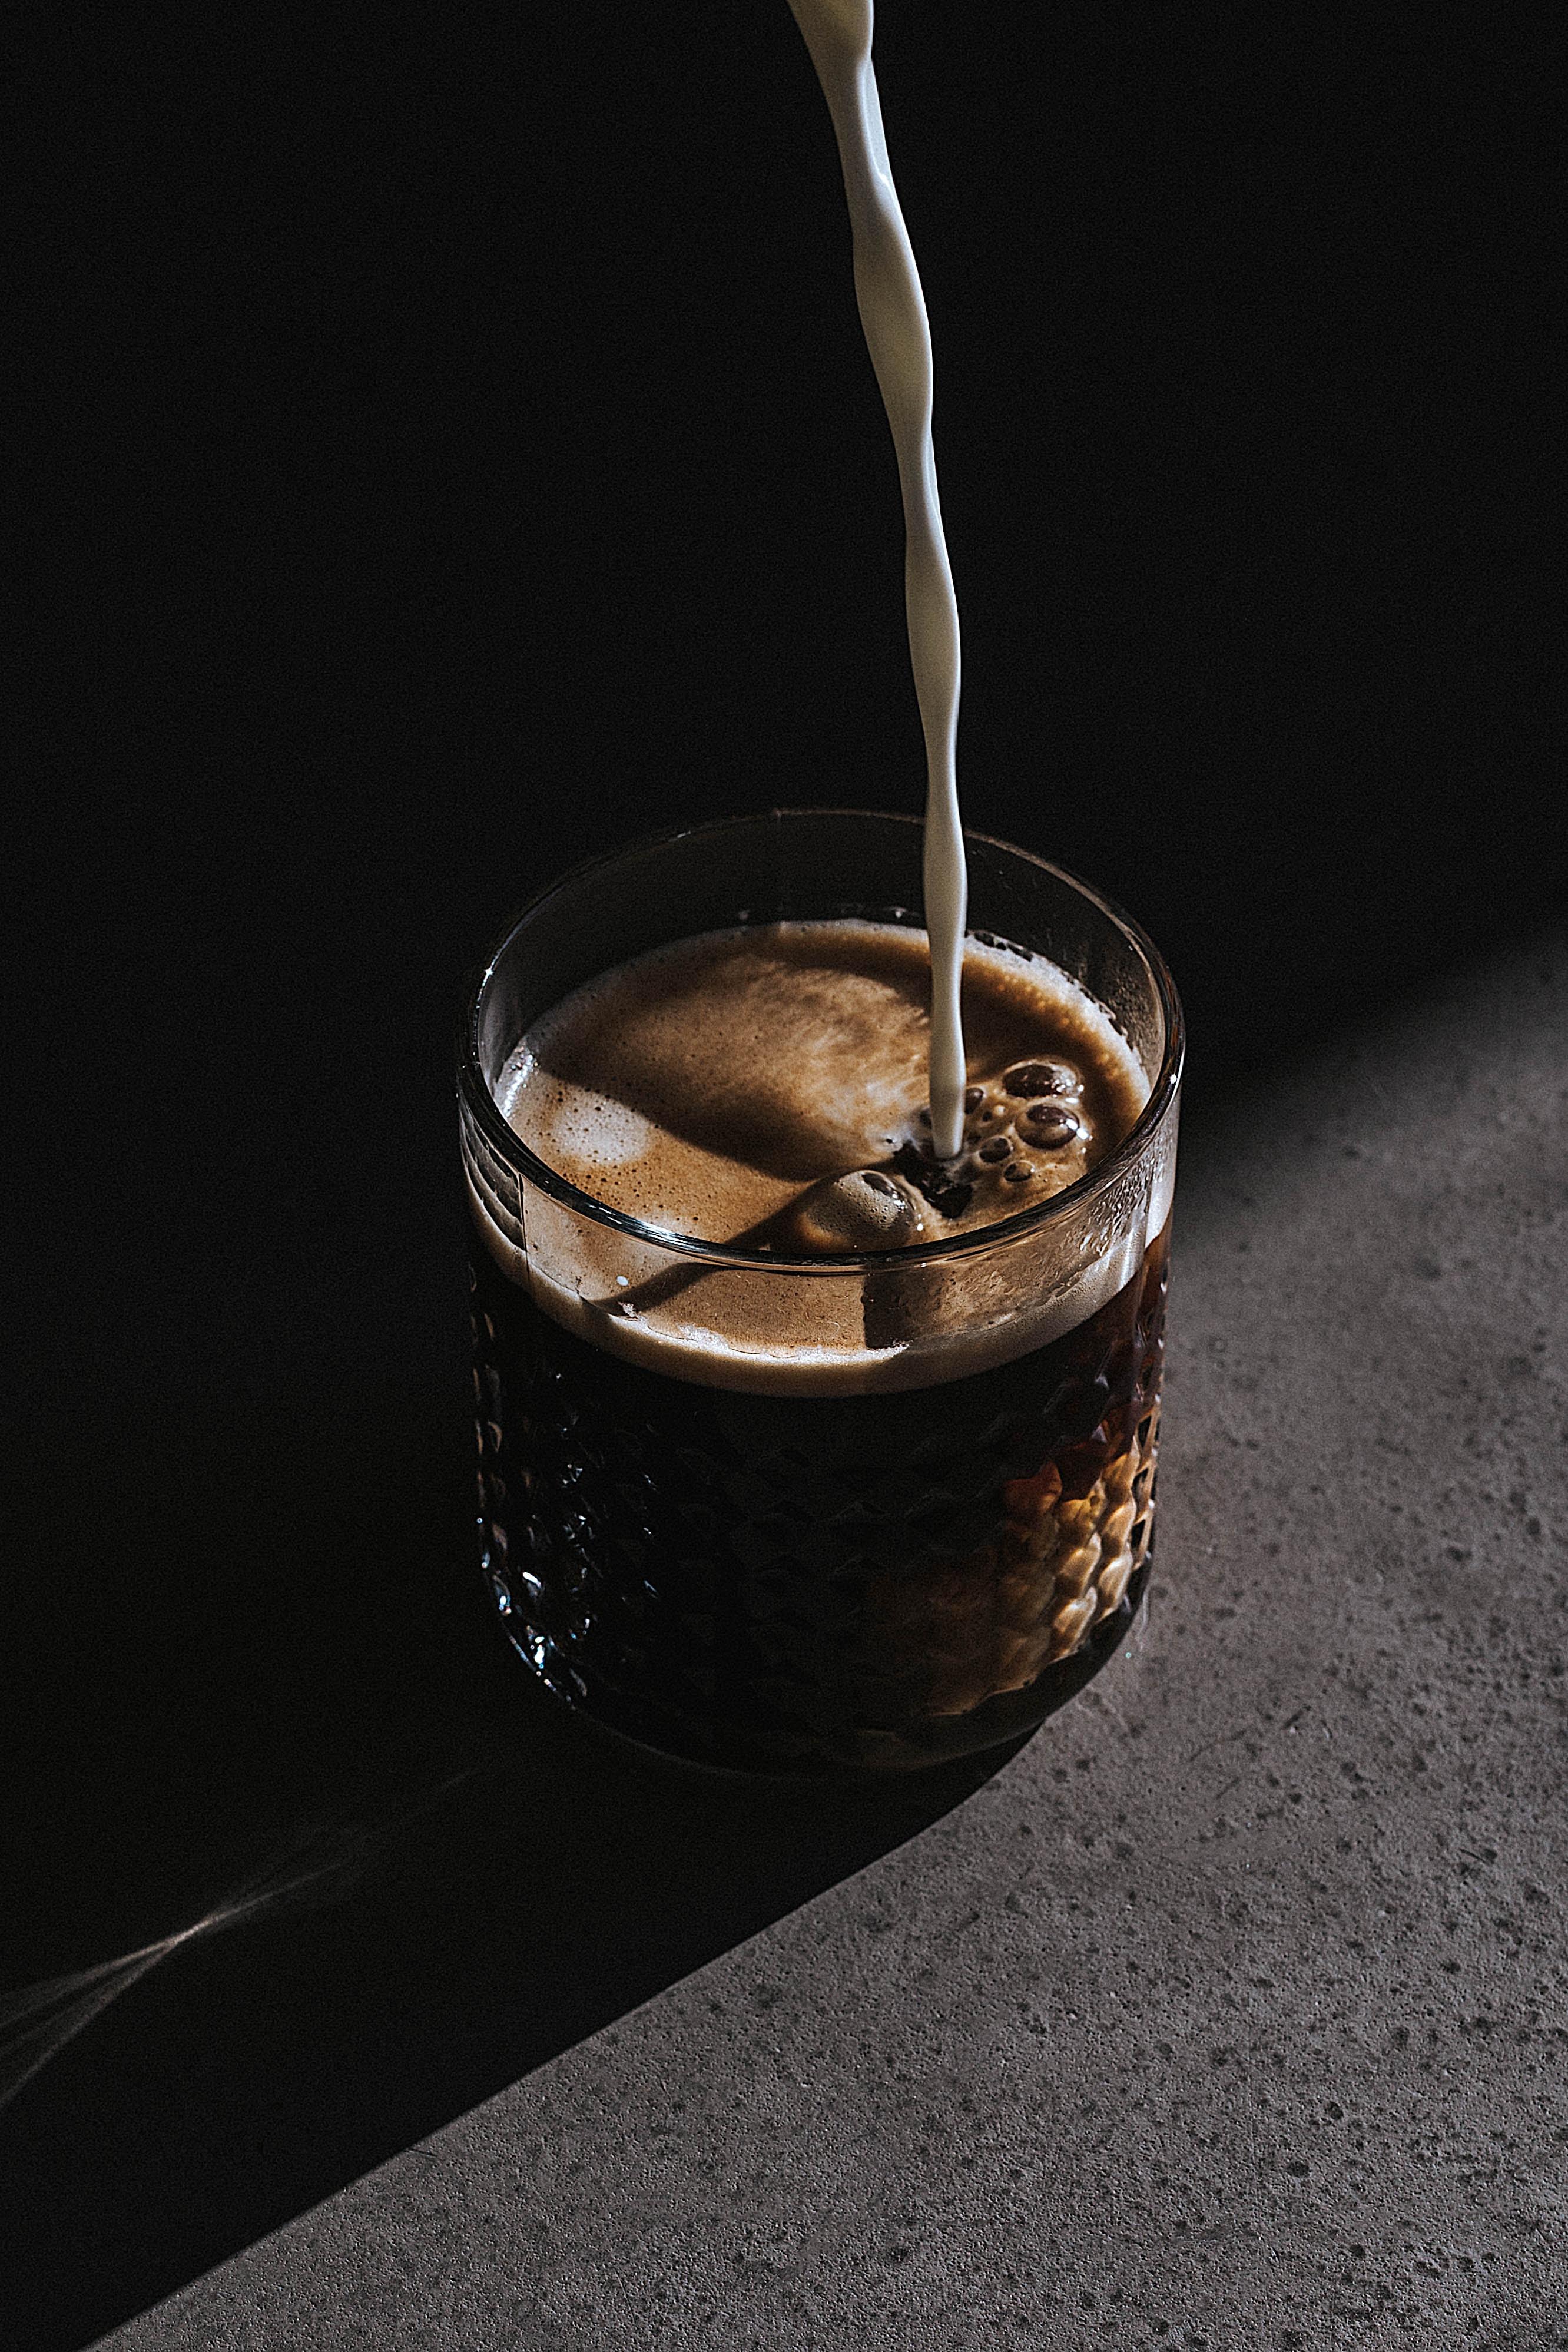 dark glass of creamy coffee